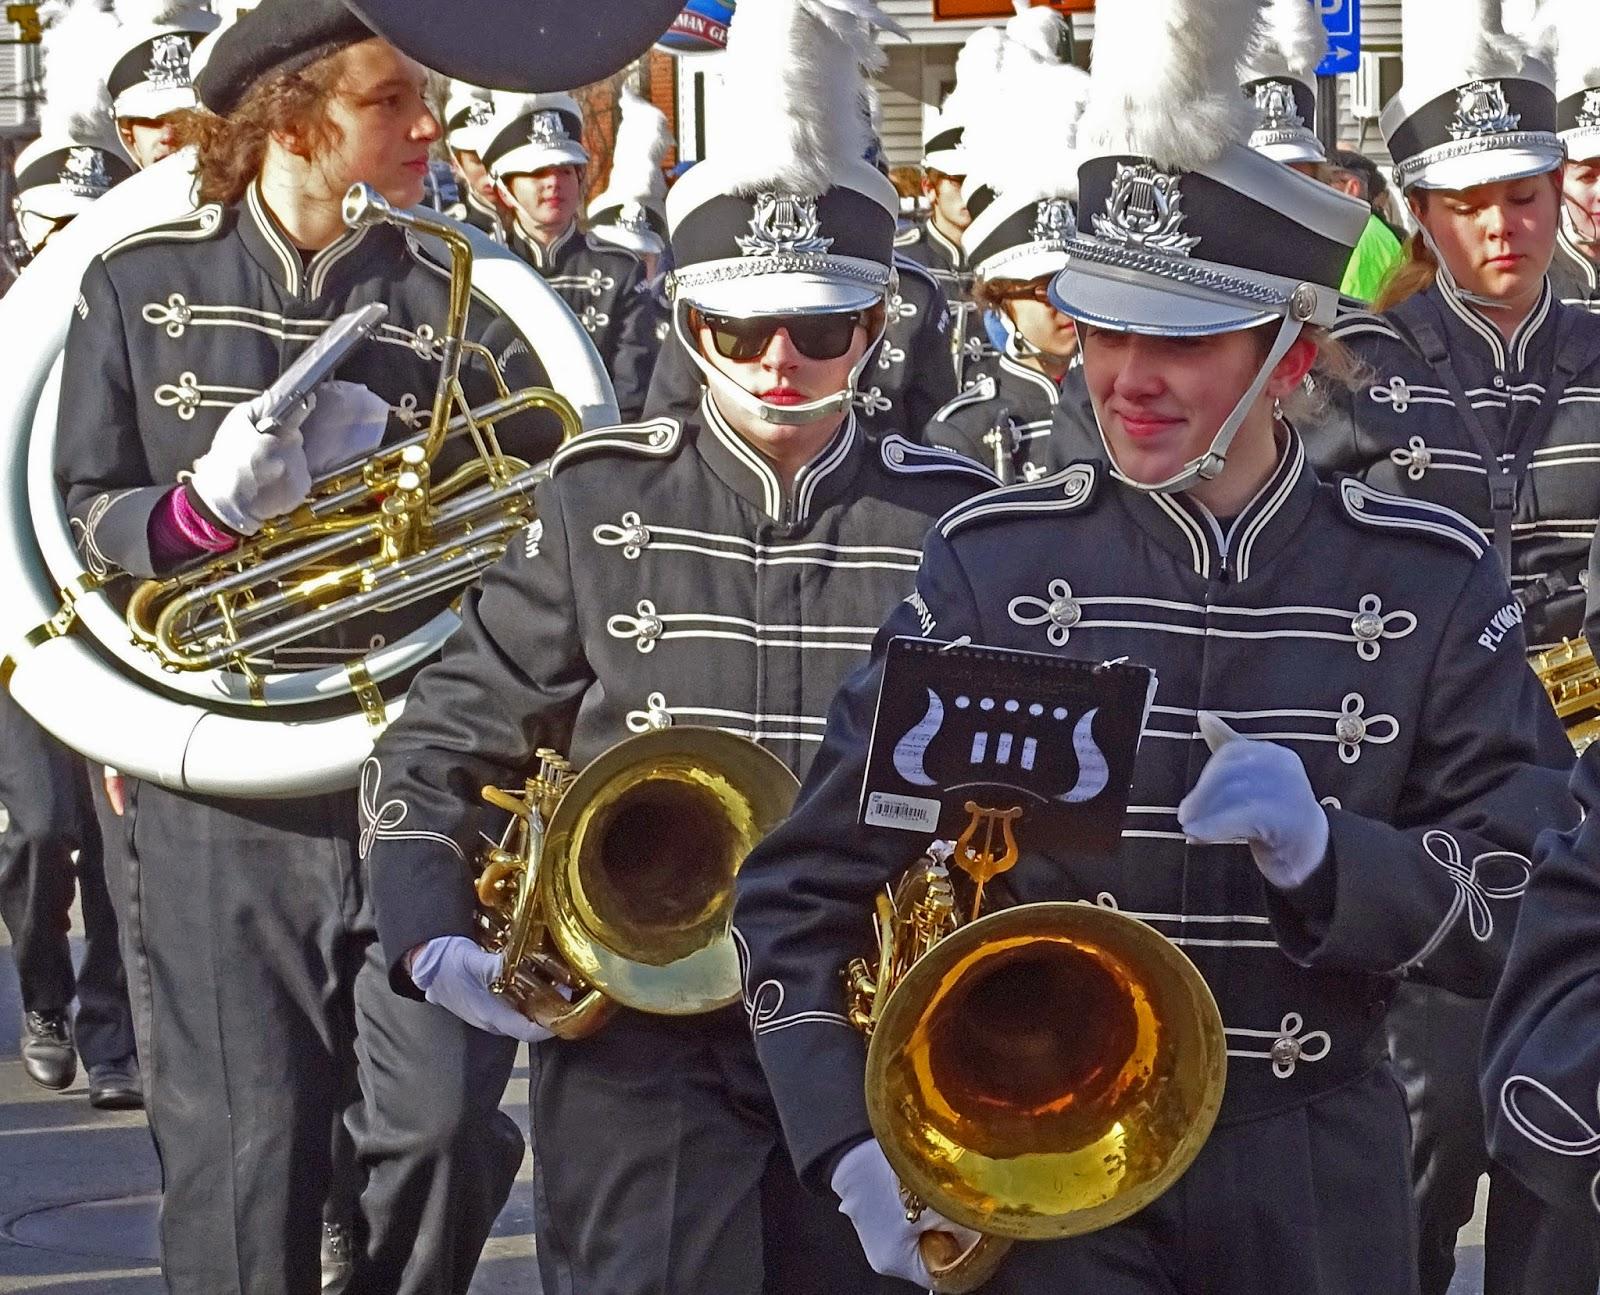 Joe S Retirement Blog Thanksgiving Parade Part 2 Of 2